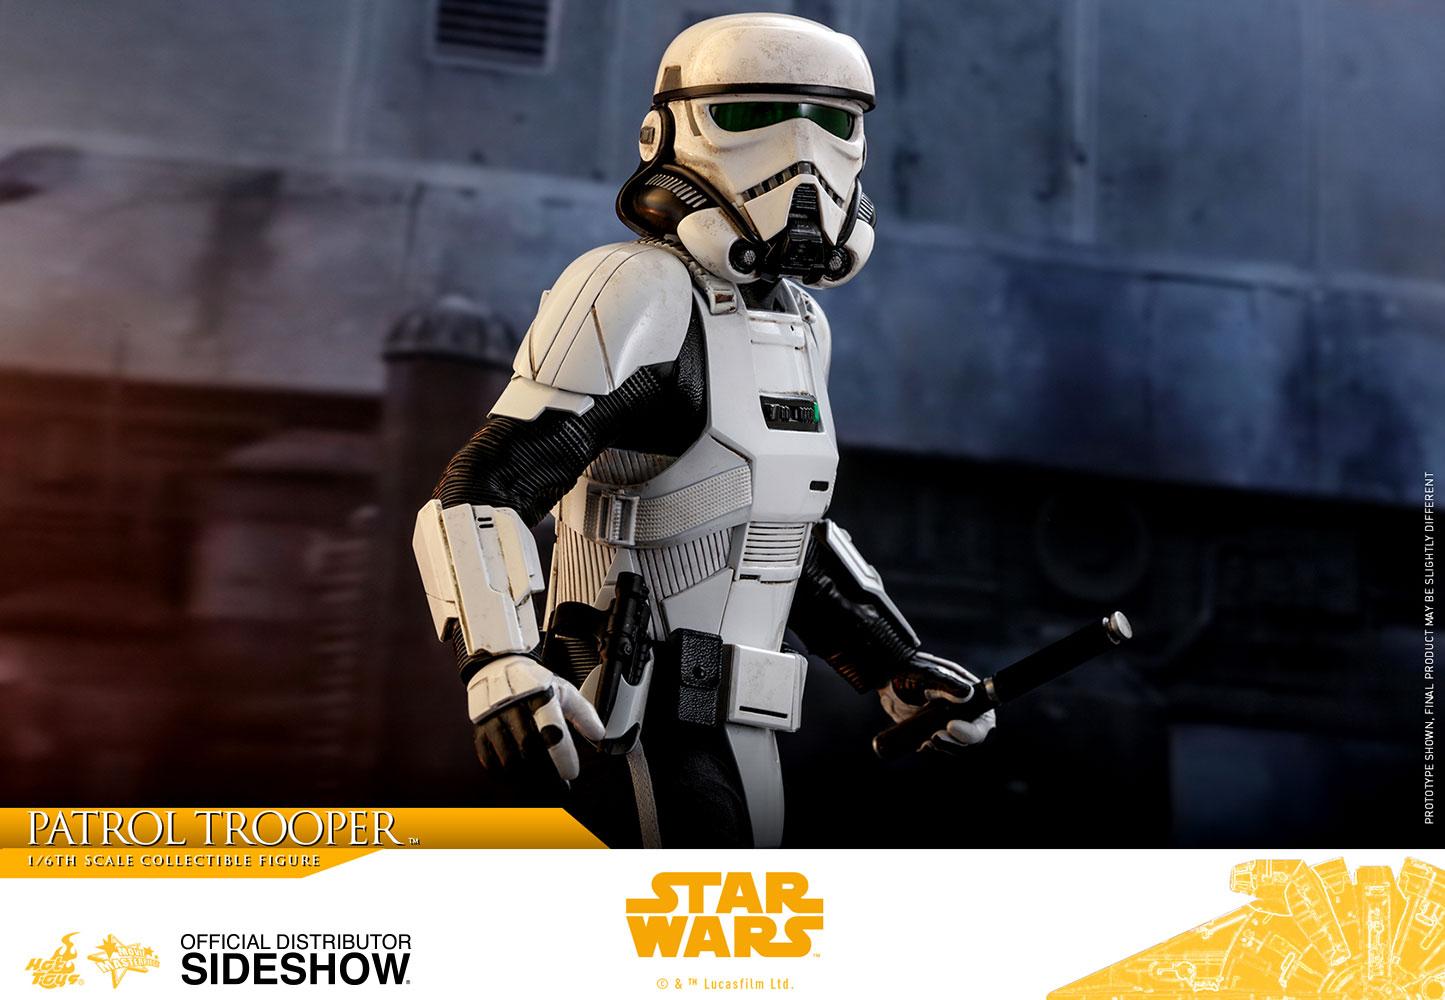 Imperial-Patrol-Trooper-sixth-scale-figure-08